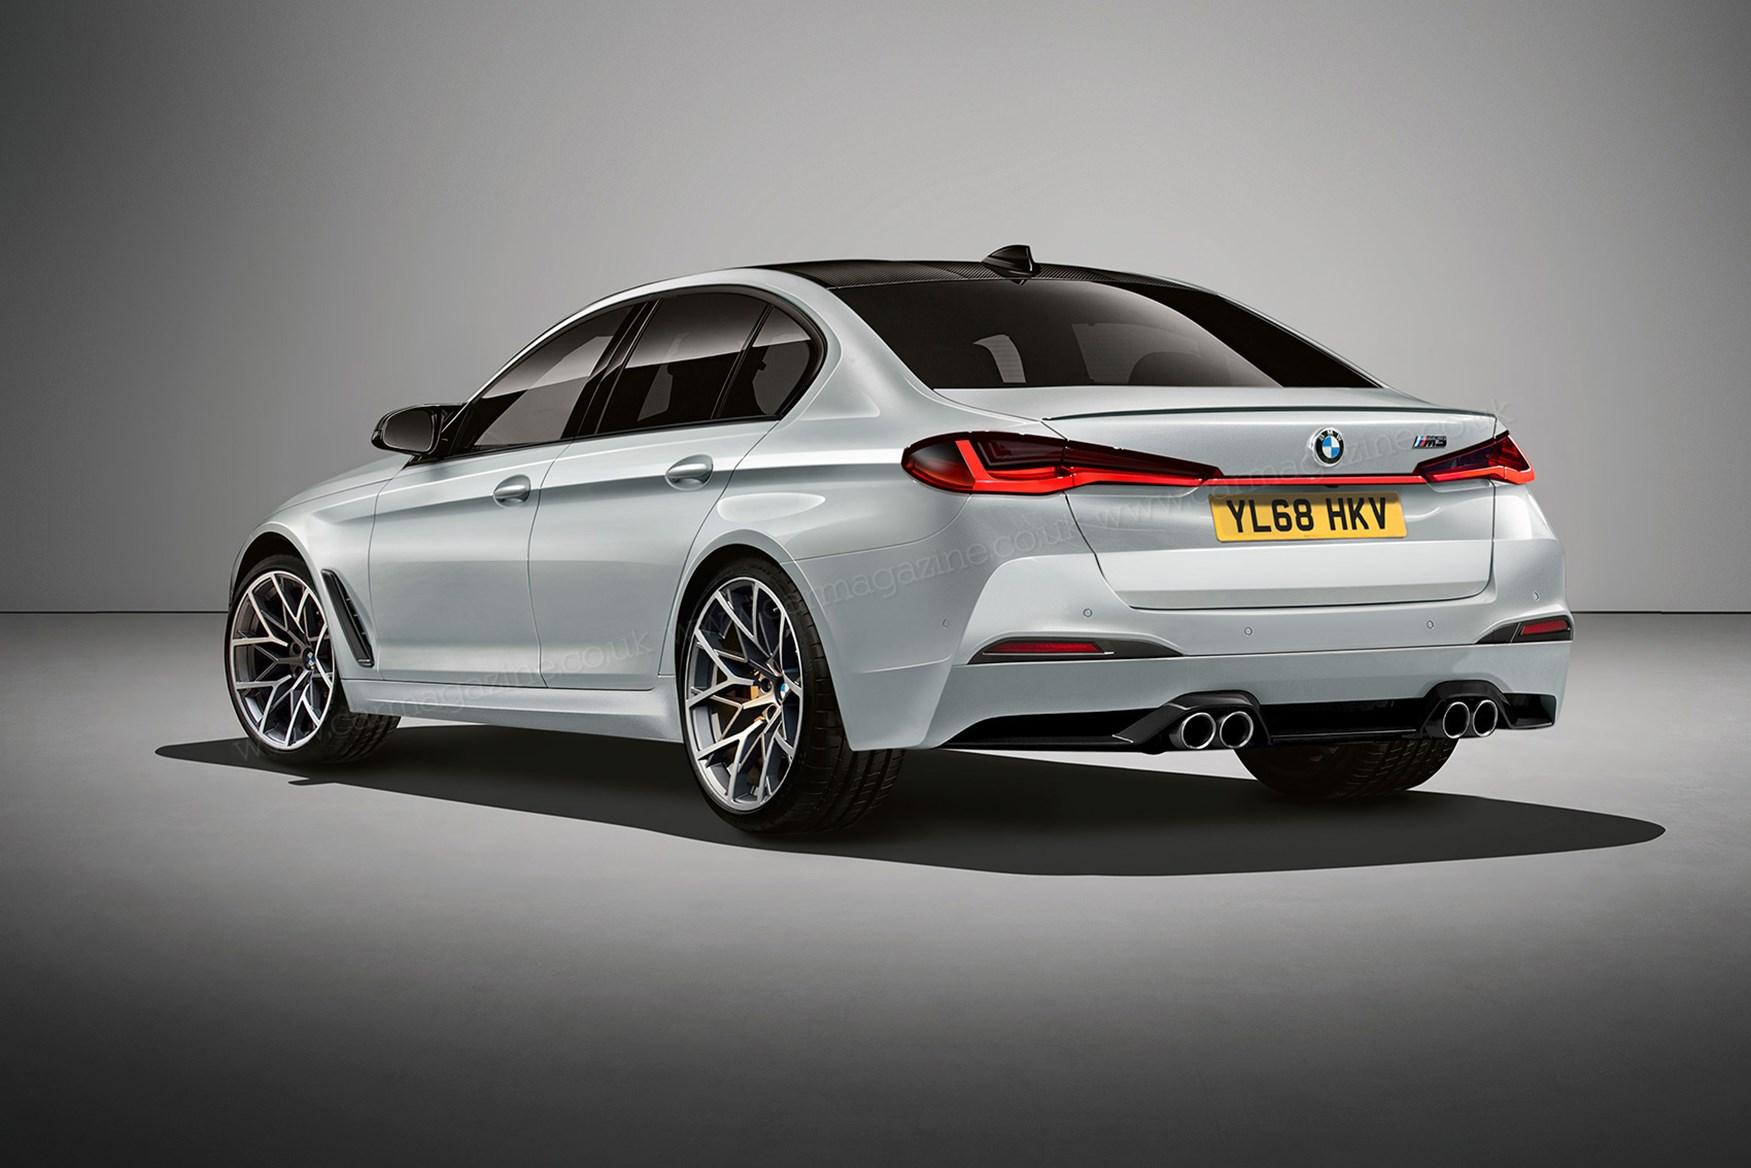 Bmw Serie 3 2018 Rendering >> New 2020 BMW M3 codenamed G80 revealed by CAR Magazine